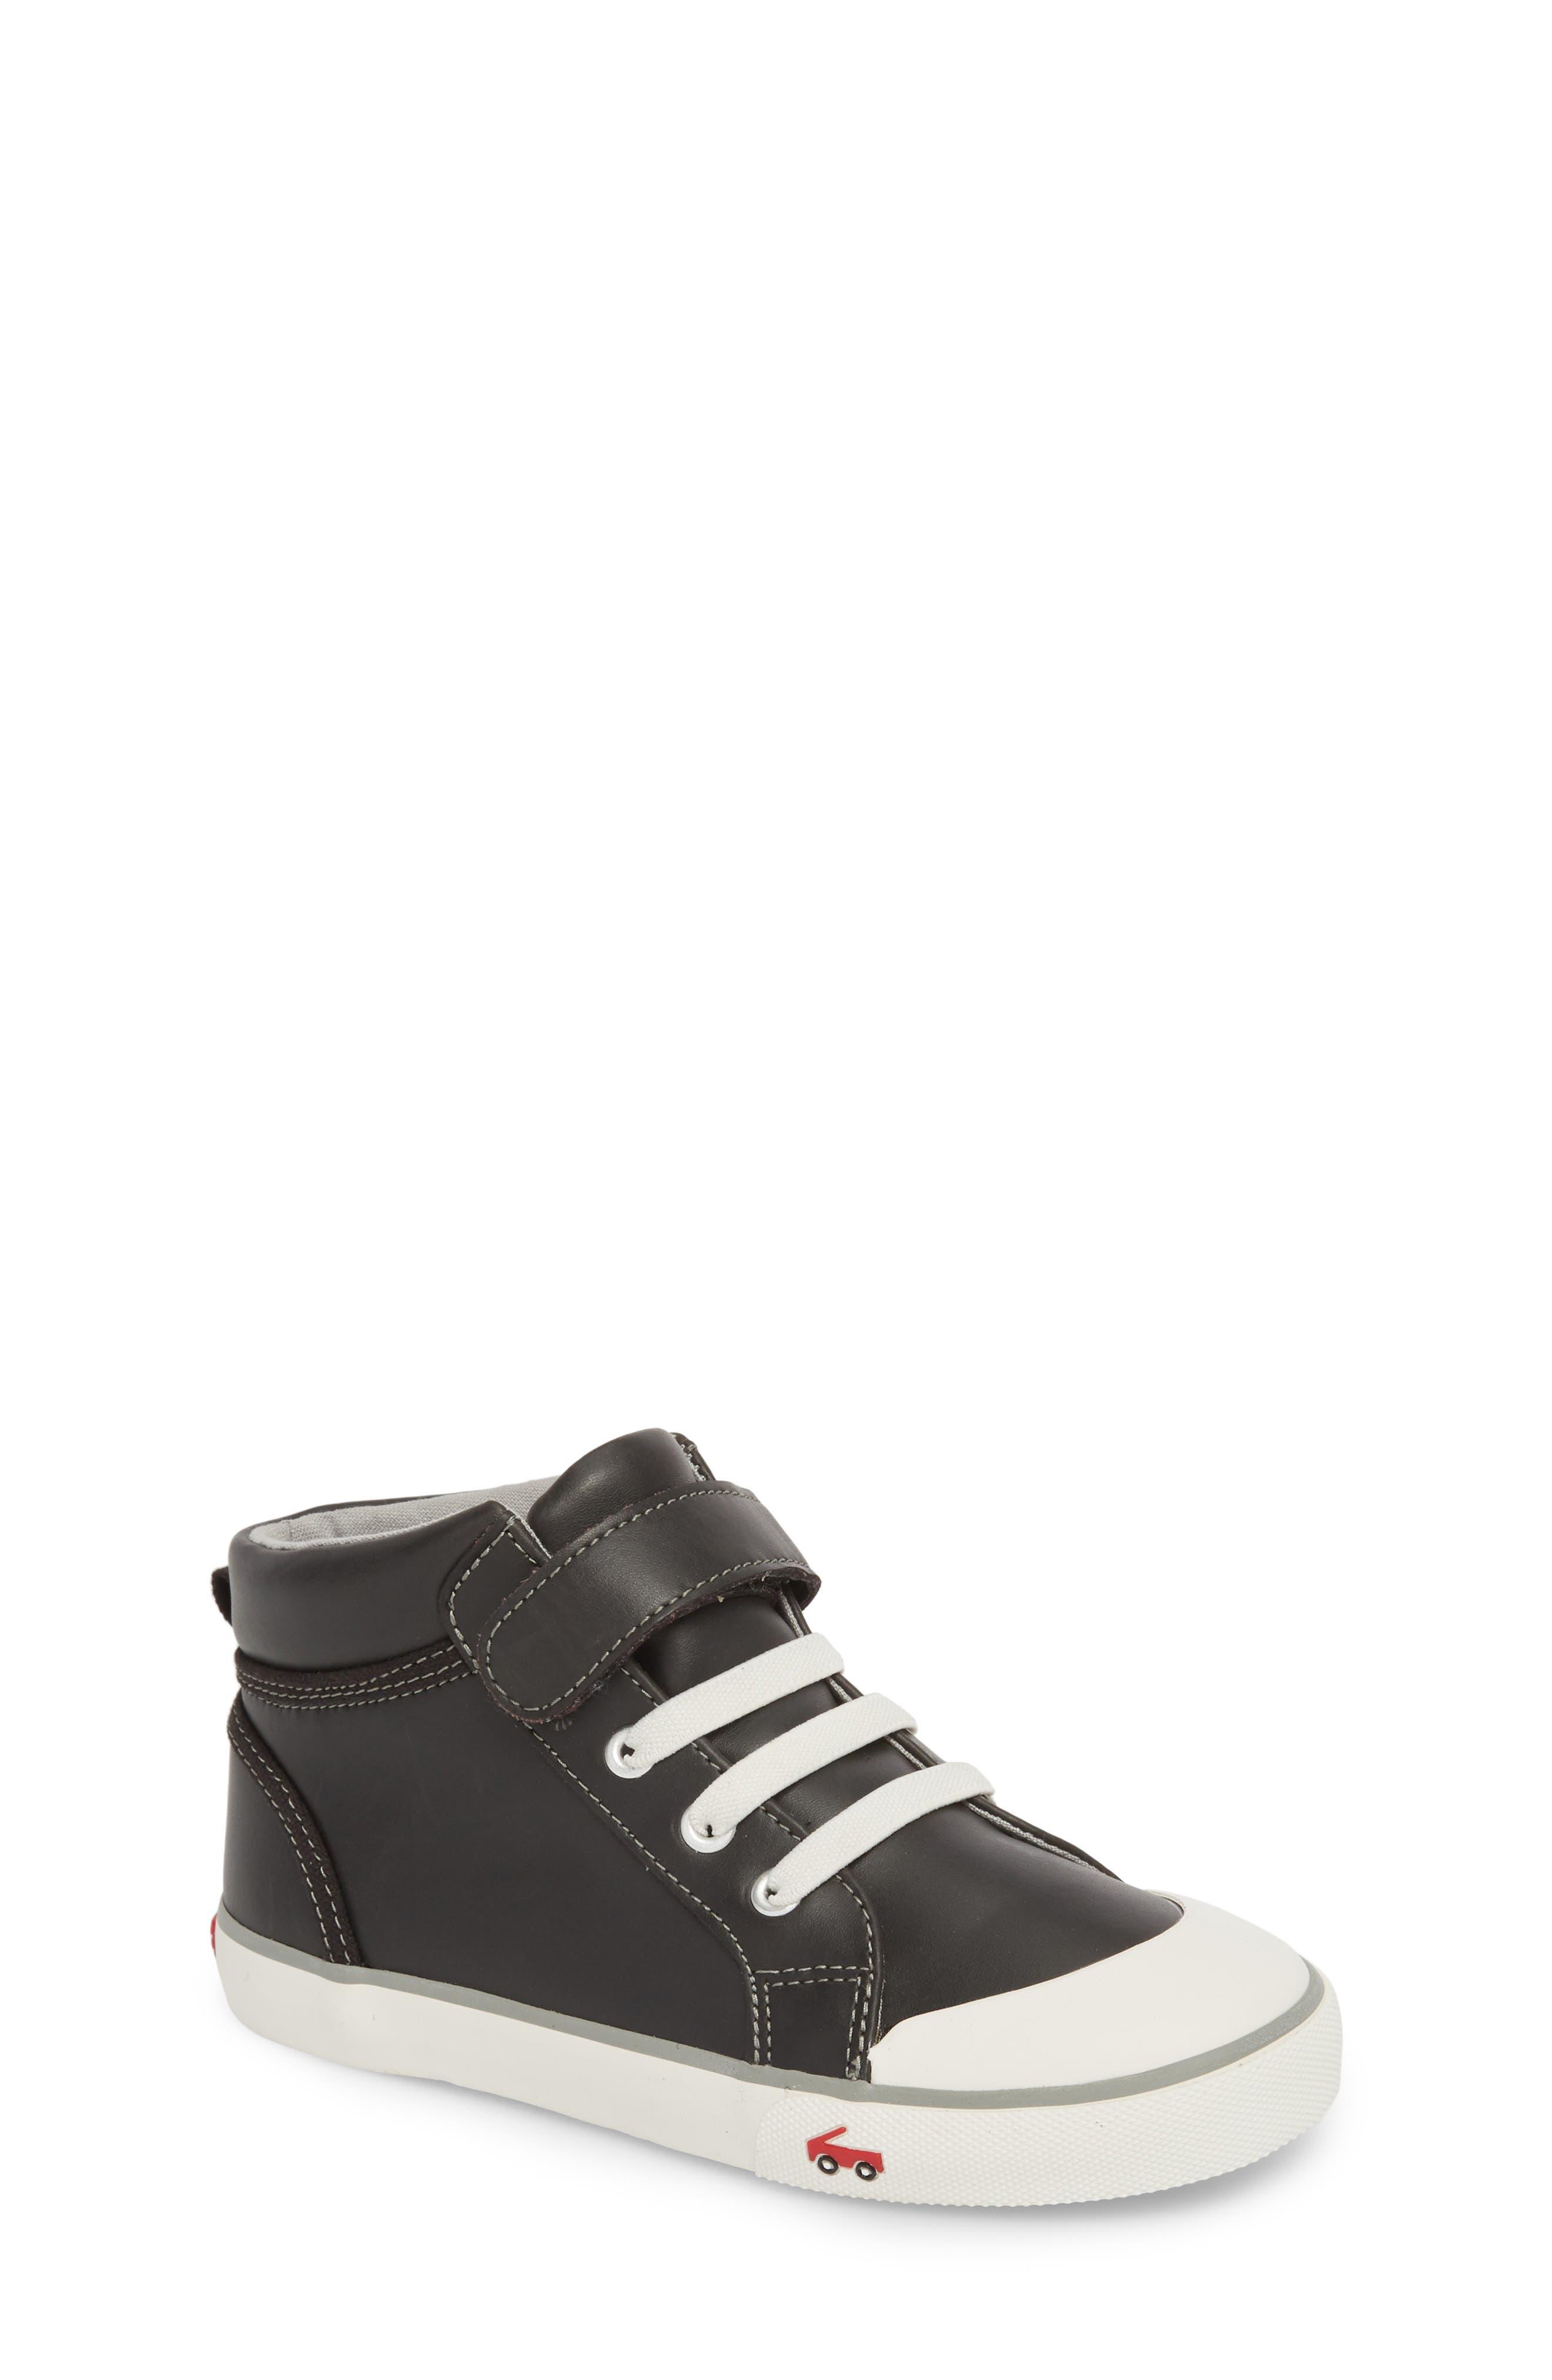 Peyton Metallic Mid Top Sneaker,                             Main thumbnail 1, color,                             Black Leather